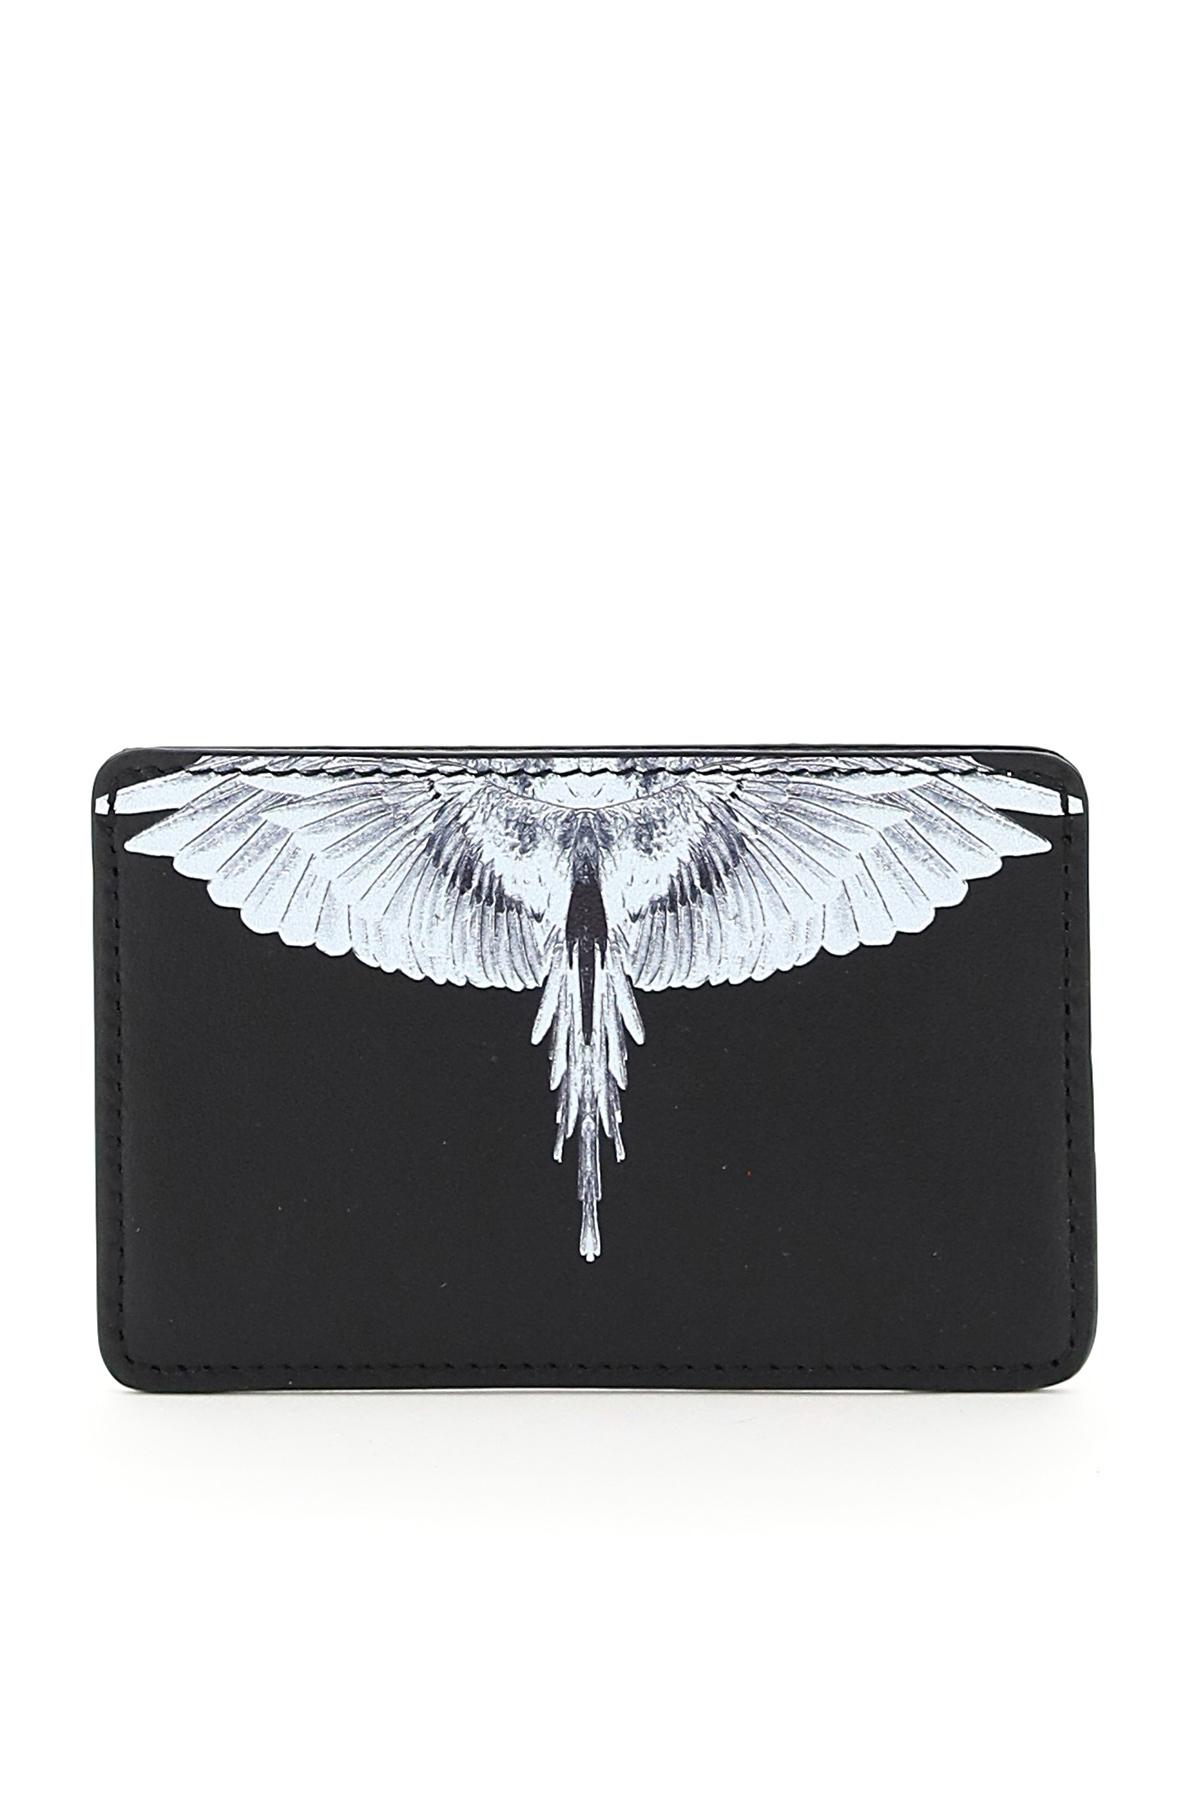 Marcelo burlon portacarte wings diagonal